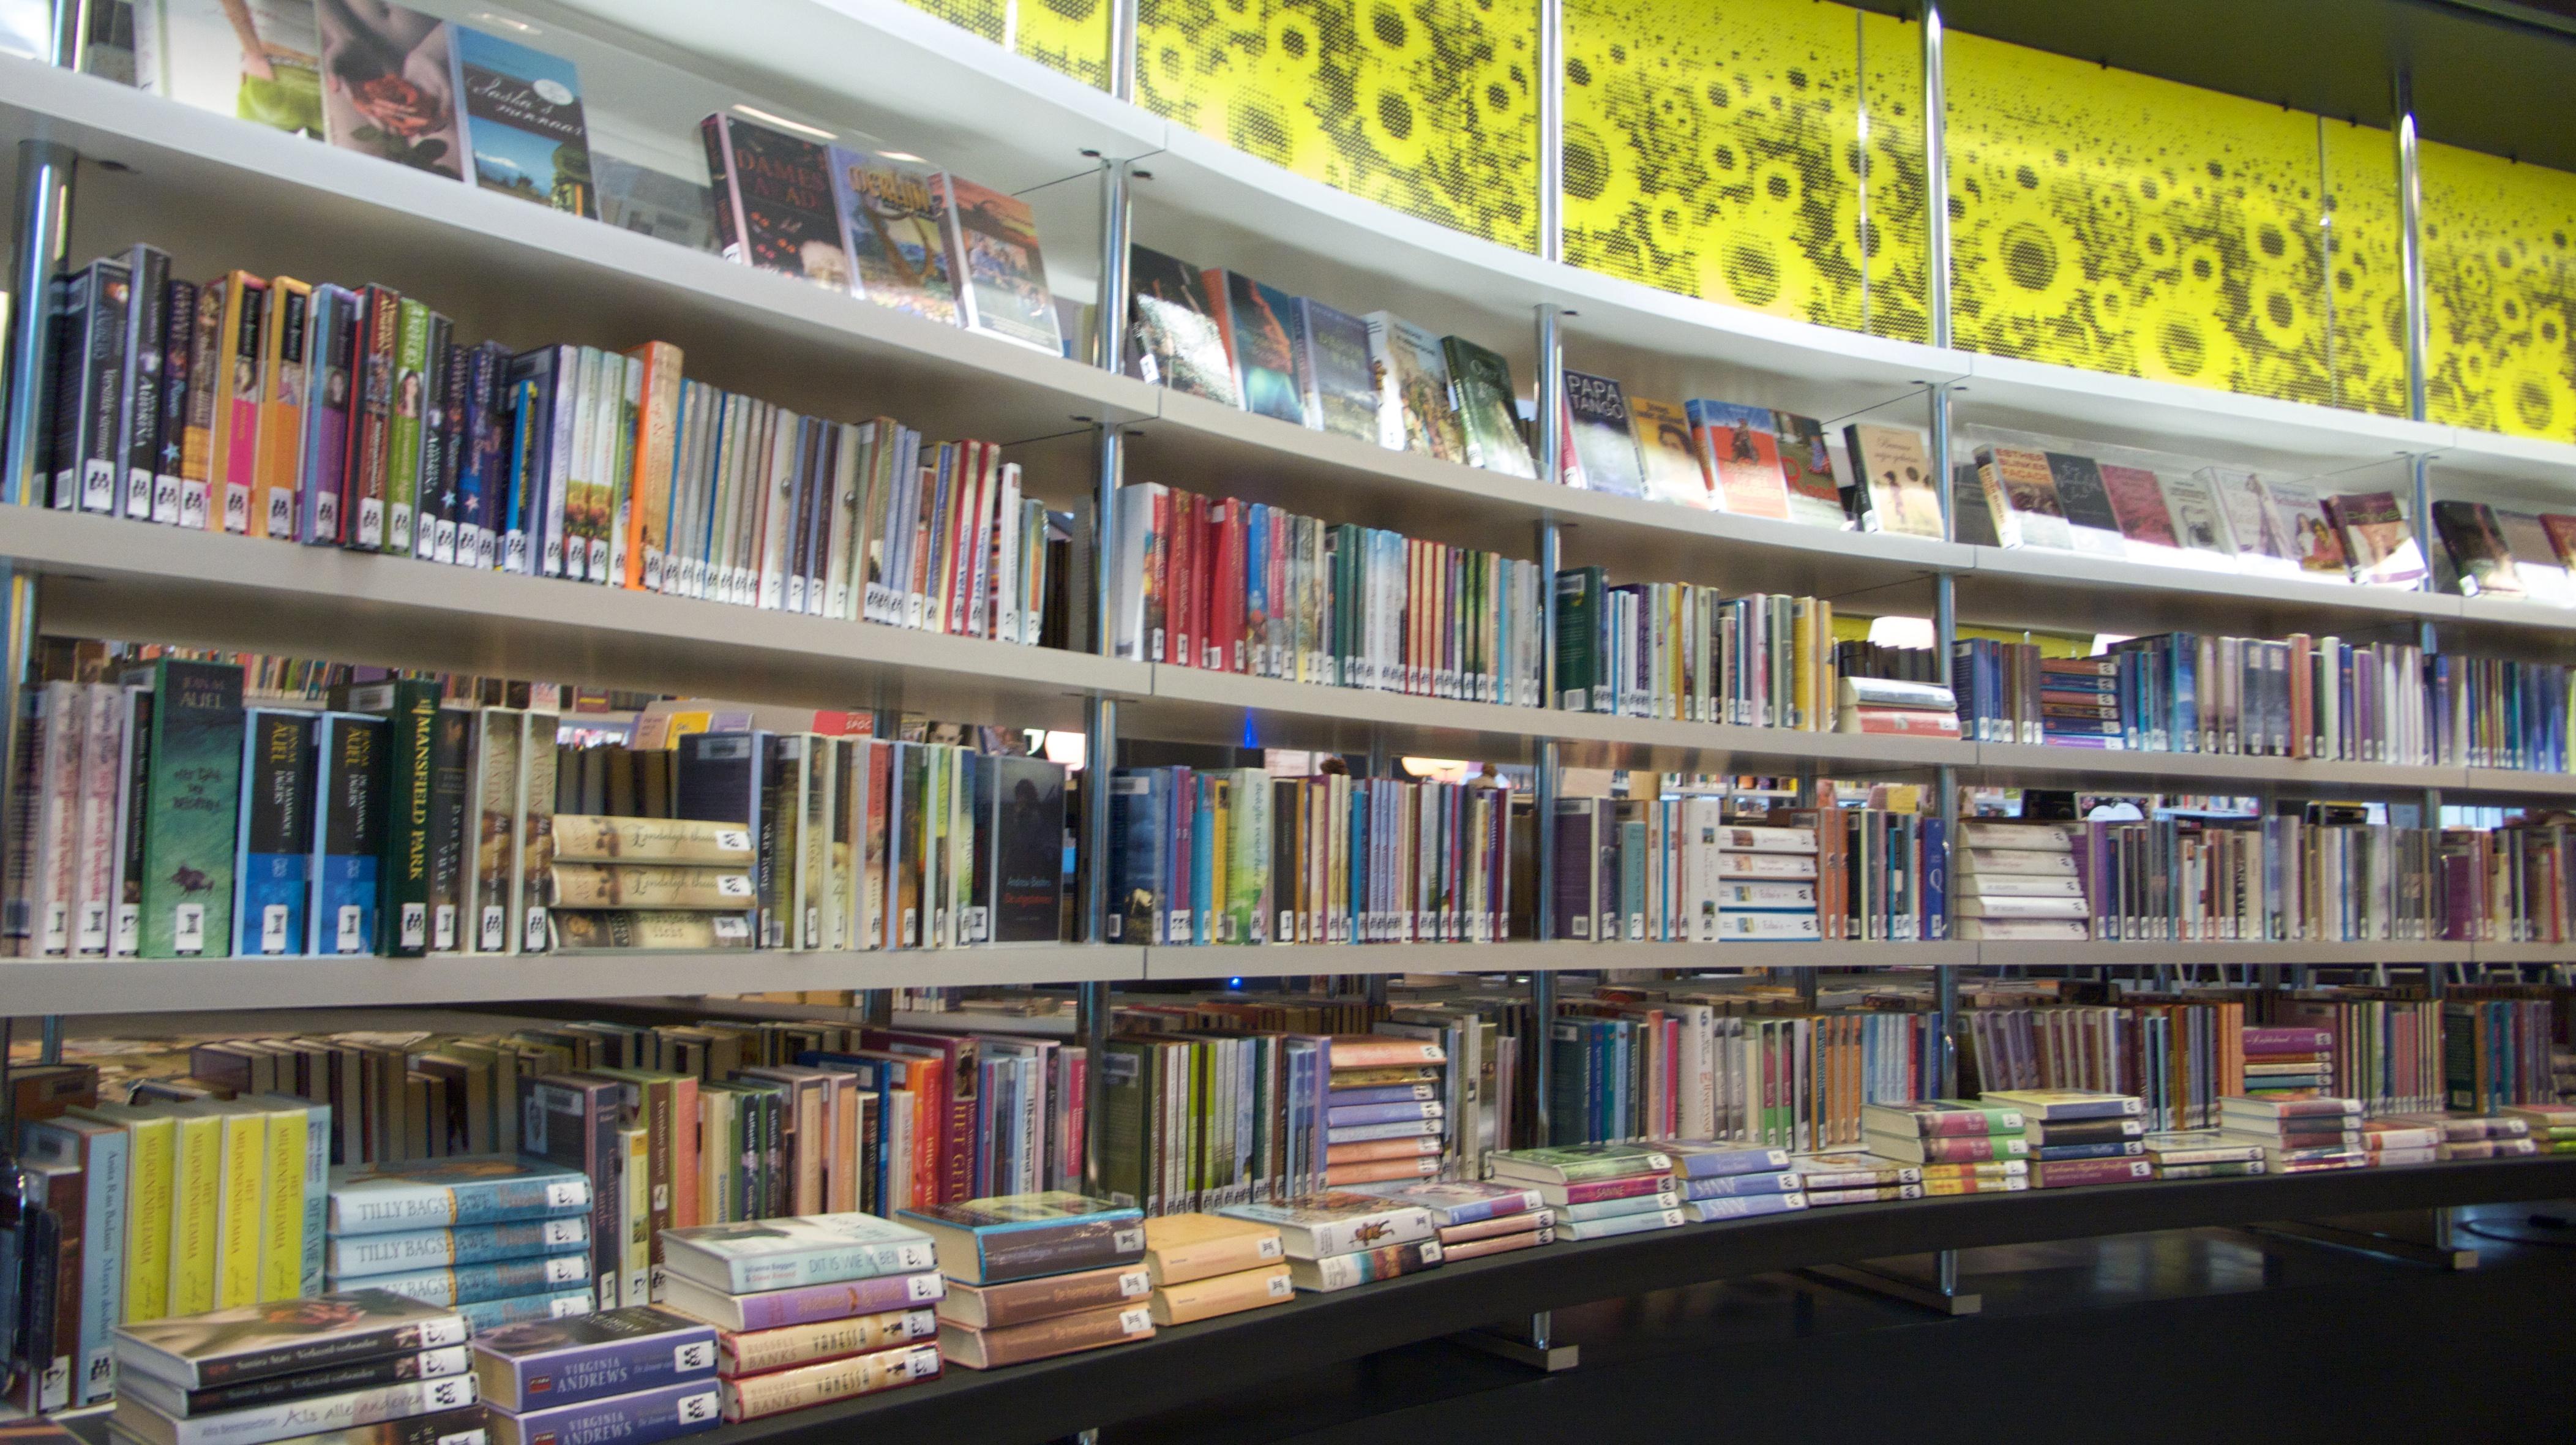 Blauw tapijt boeken kast boeken kasten boekenkast bibliotheek boekenkast ikea billy - Eigentijdse boekenkast ...